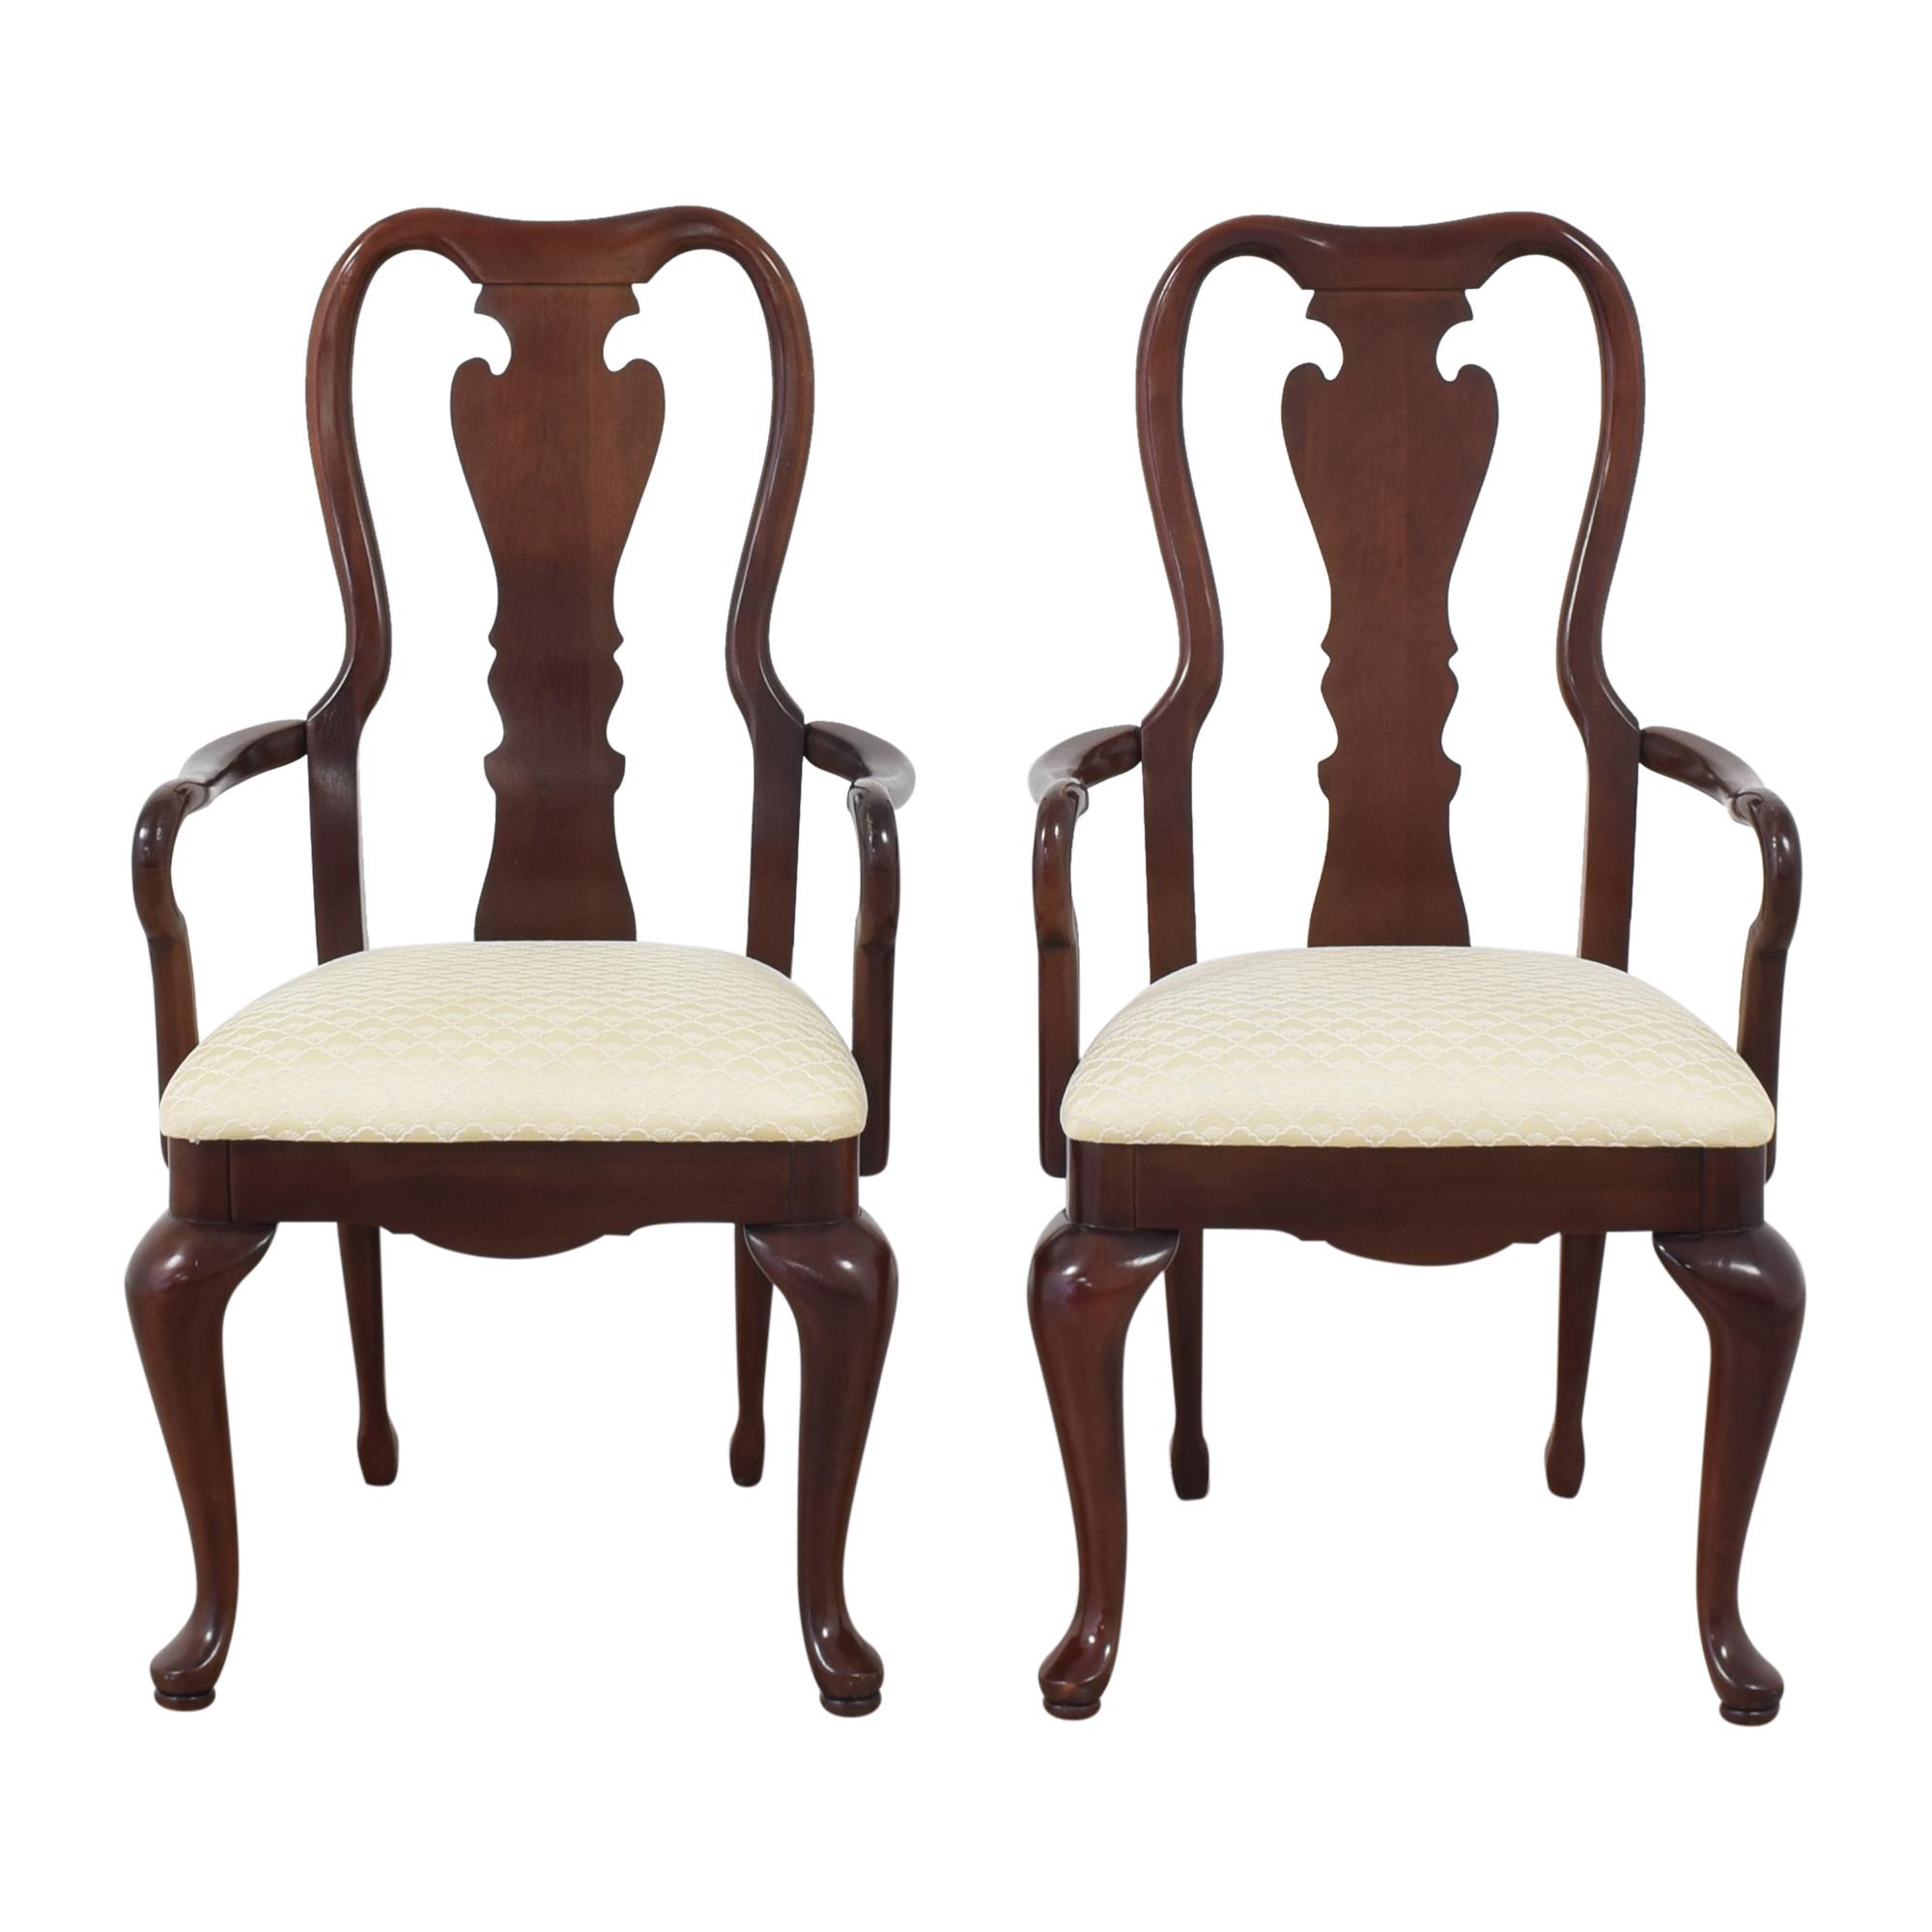 buy Thomasville Winston Court Collection Armchairs Thomasville Chairs